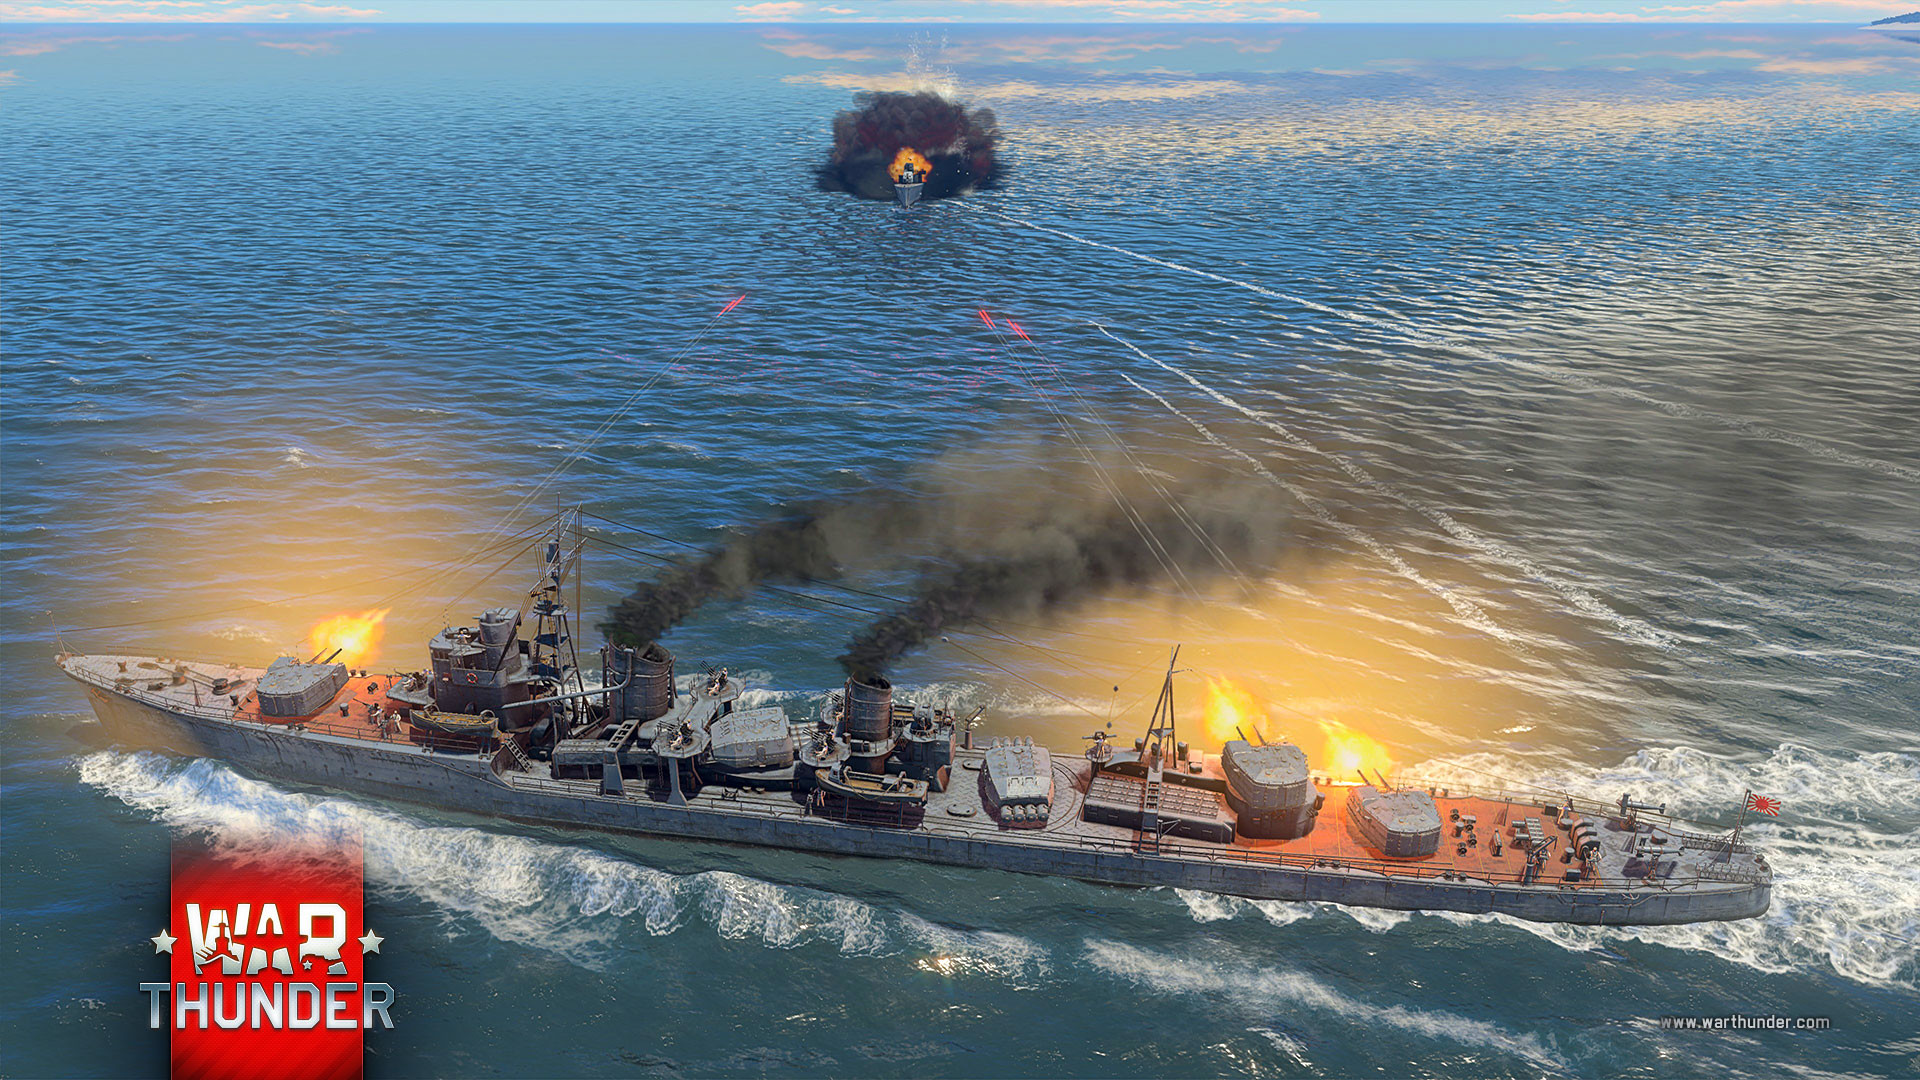 Kiyoshimo War Thunder